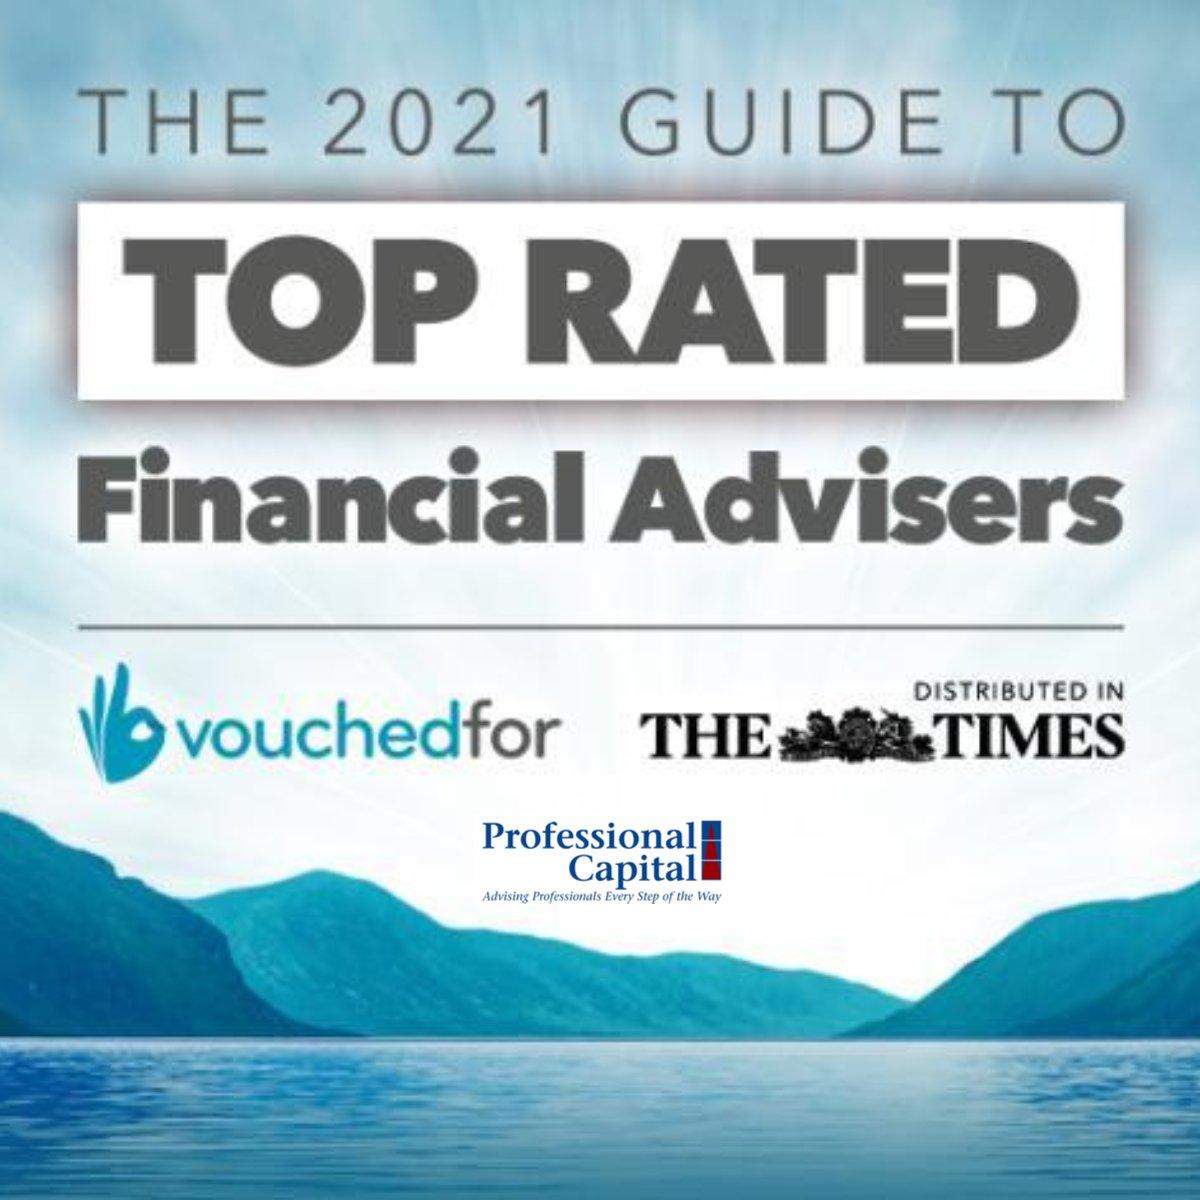 Vouchedfor 2021 UK's Top Financial Advisers